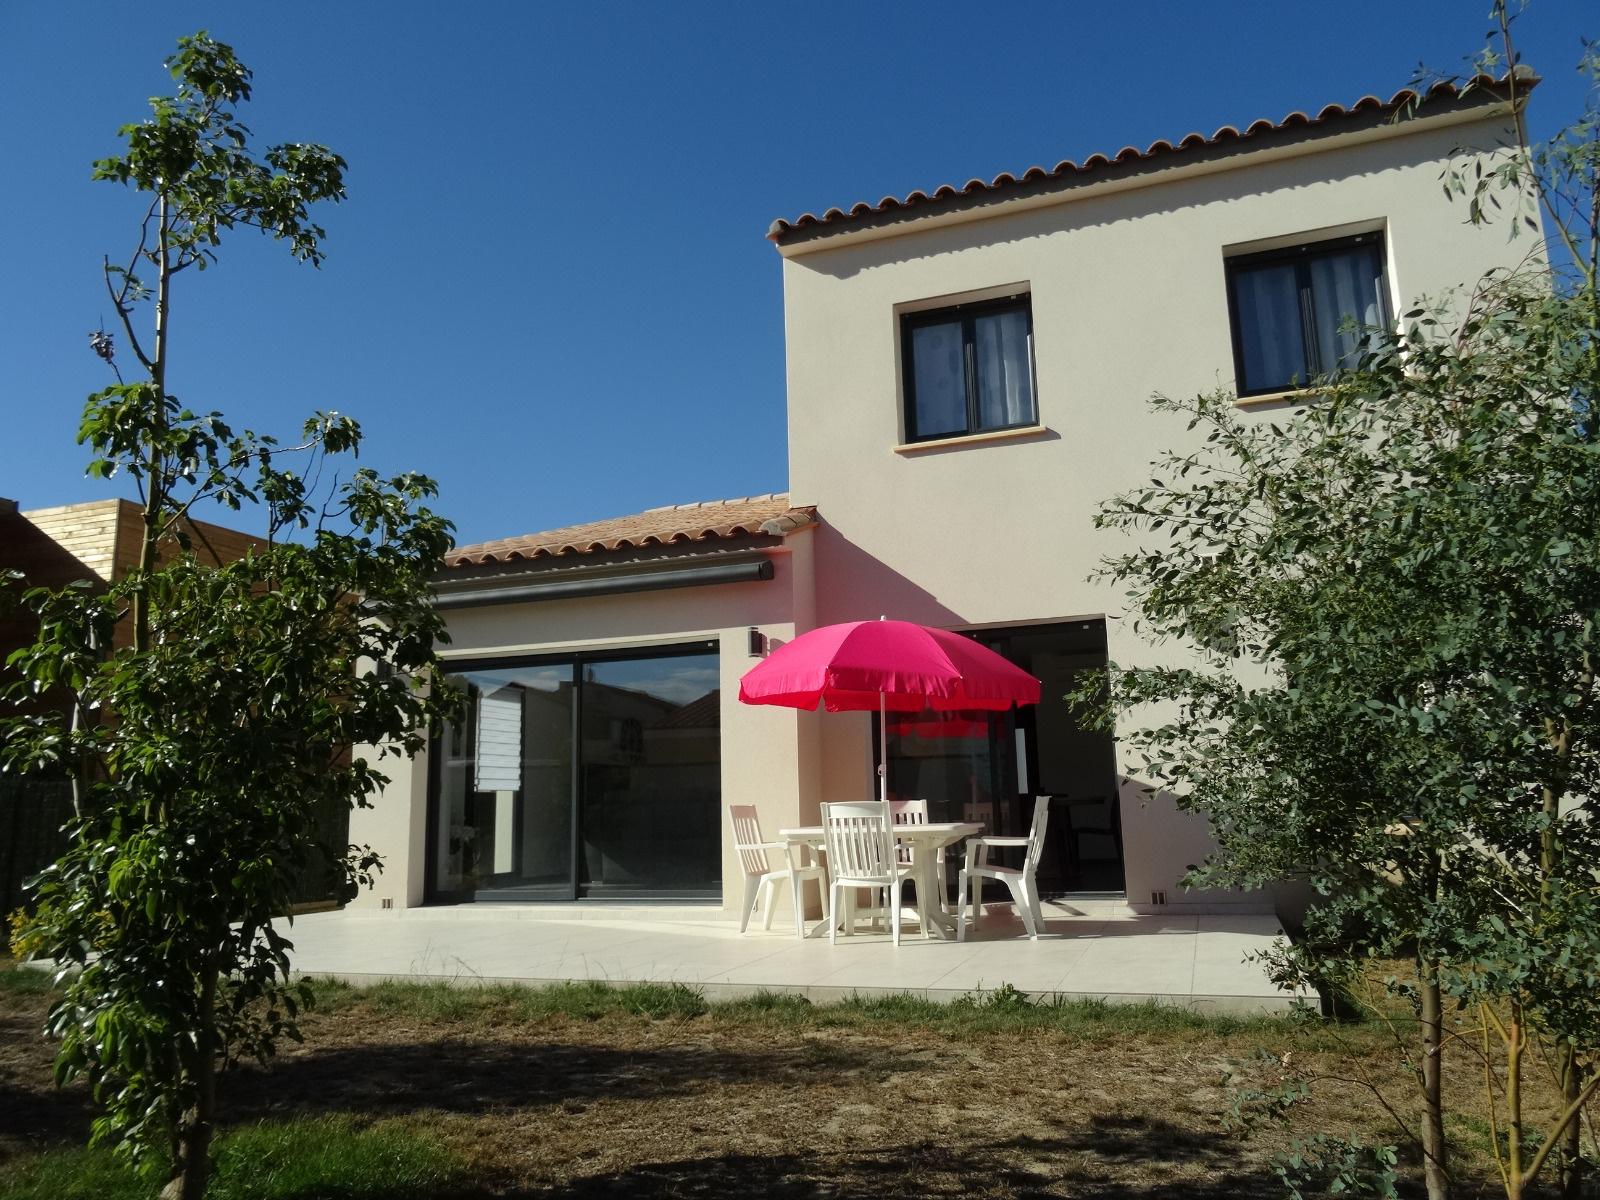 Casting immobilier l 39 immobilier perpignan centre for Immobilier perpignan